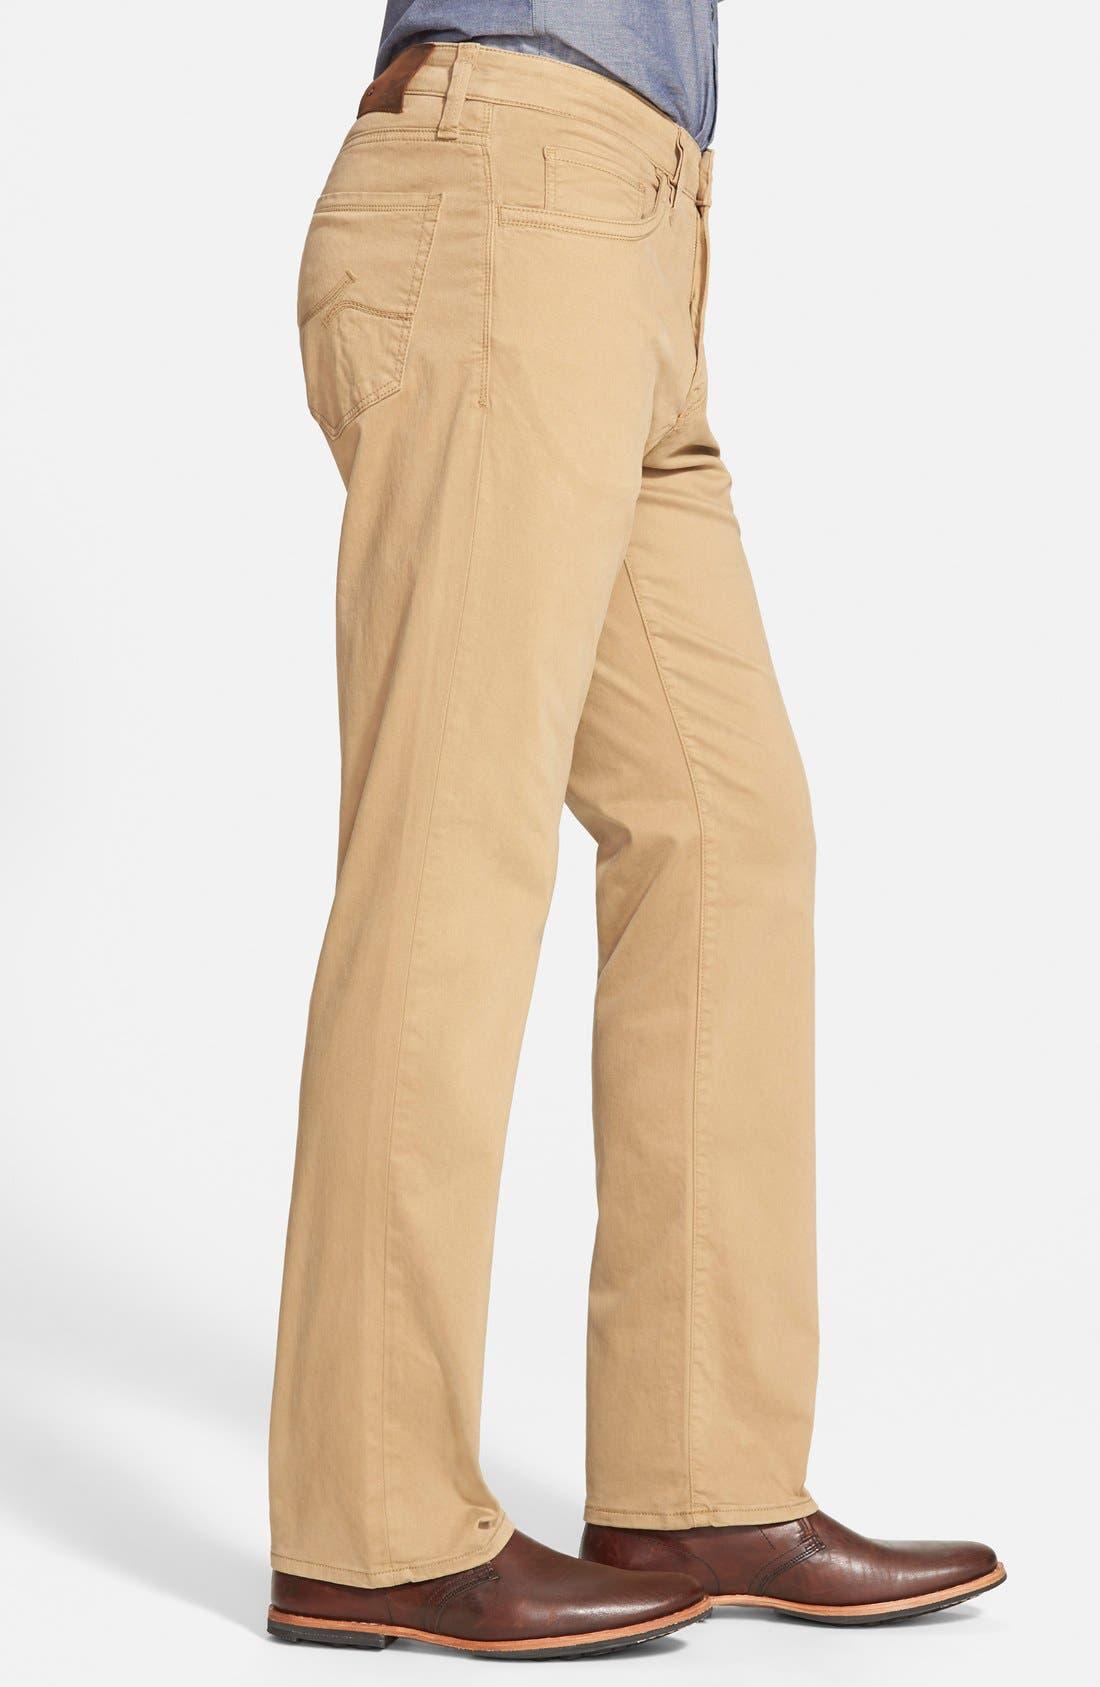 'Charisma' Classic Relaxed Fit Pants,                             Alternate thumbnail 3, color,                             BEIGE/ KHAKI